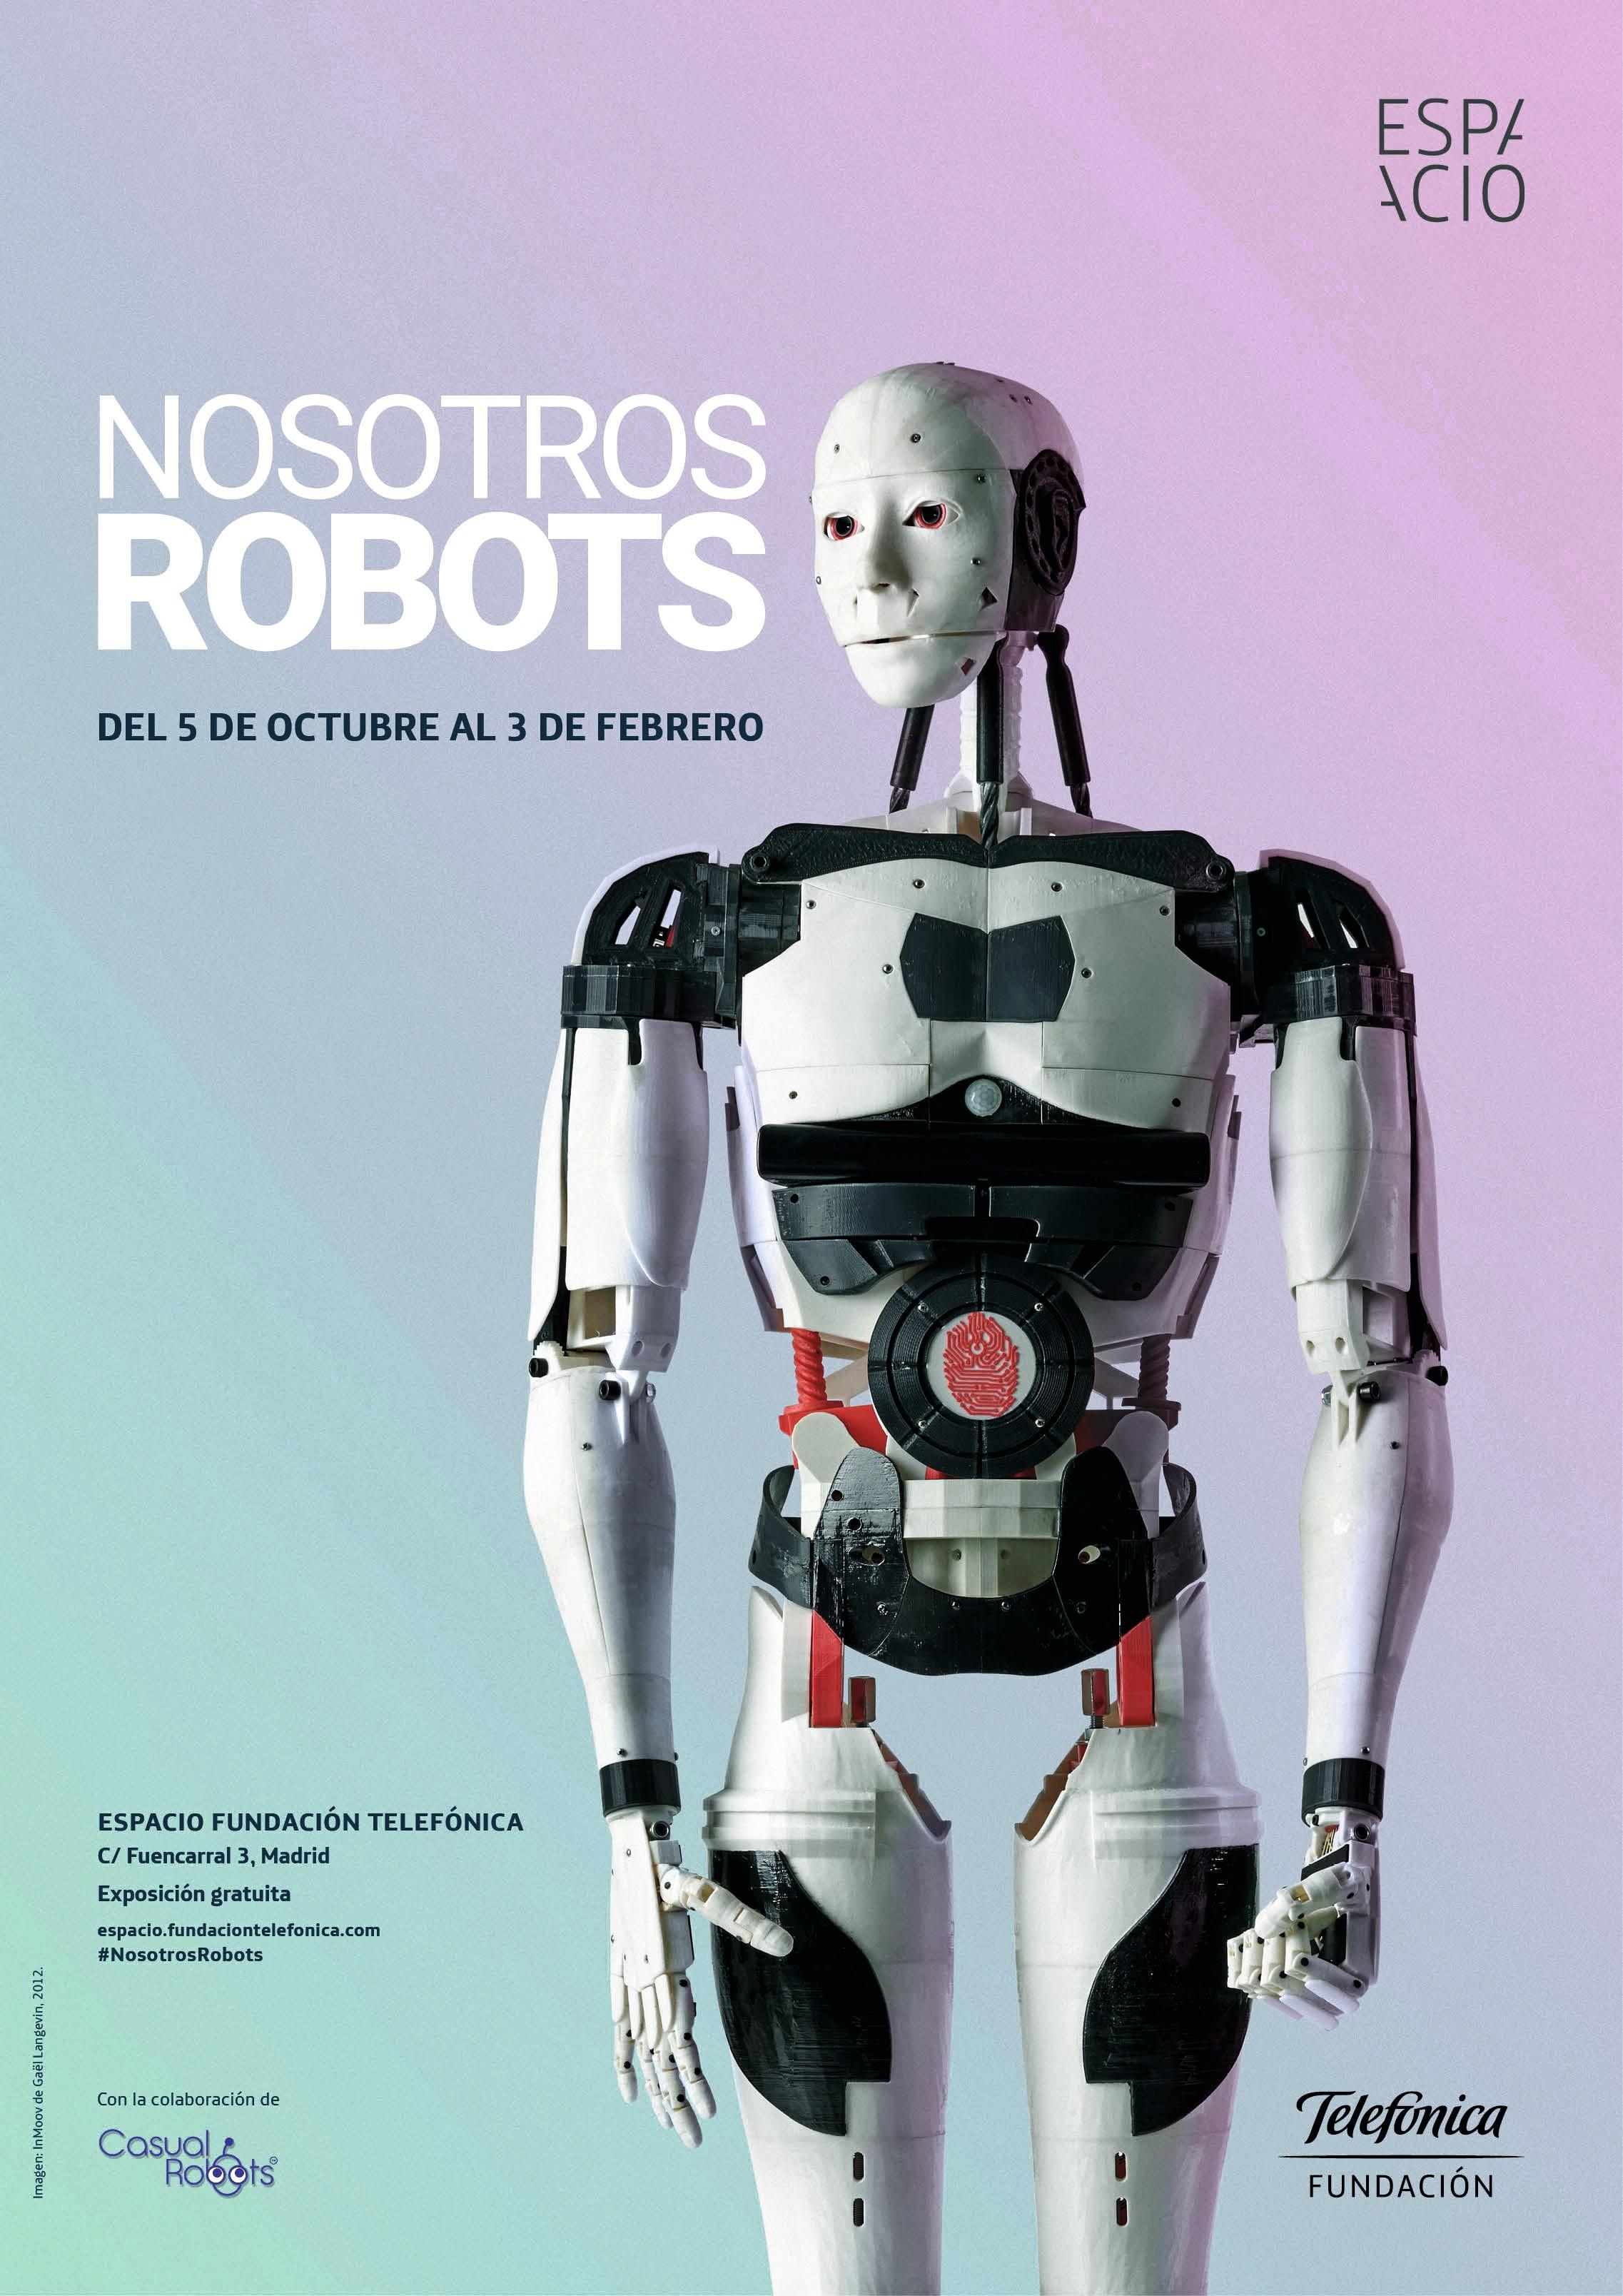 Exposición Nosotros robots, Fundación Telefónica, 2018.